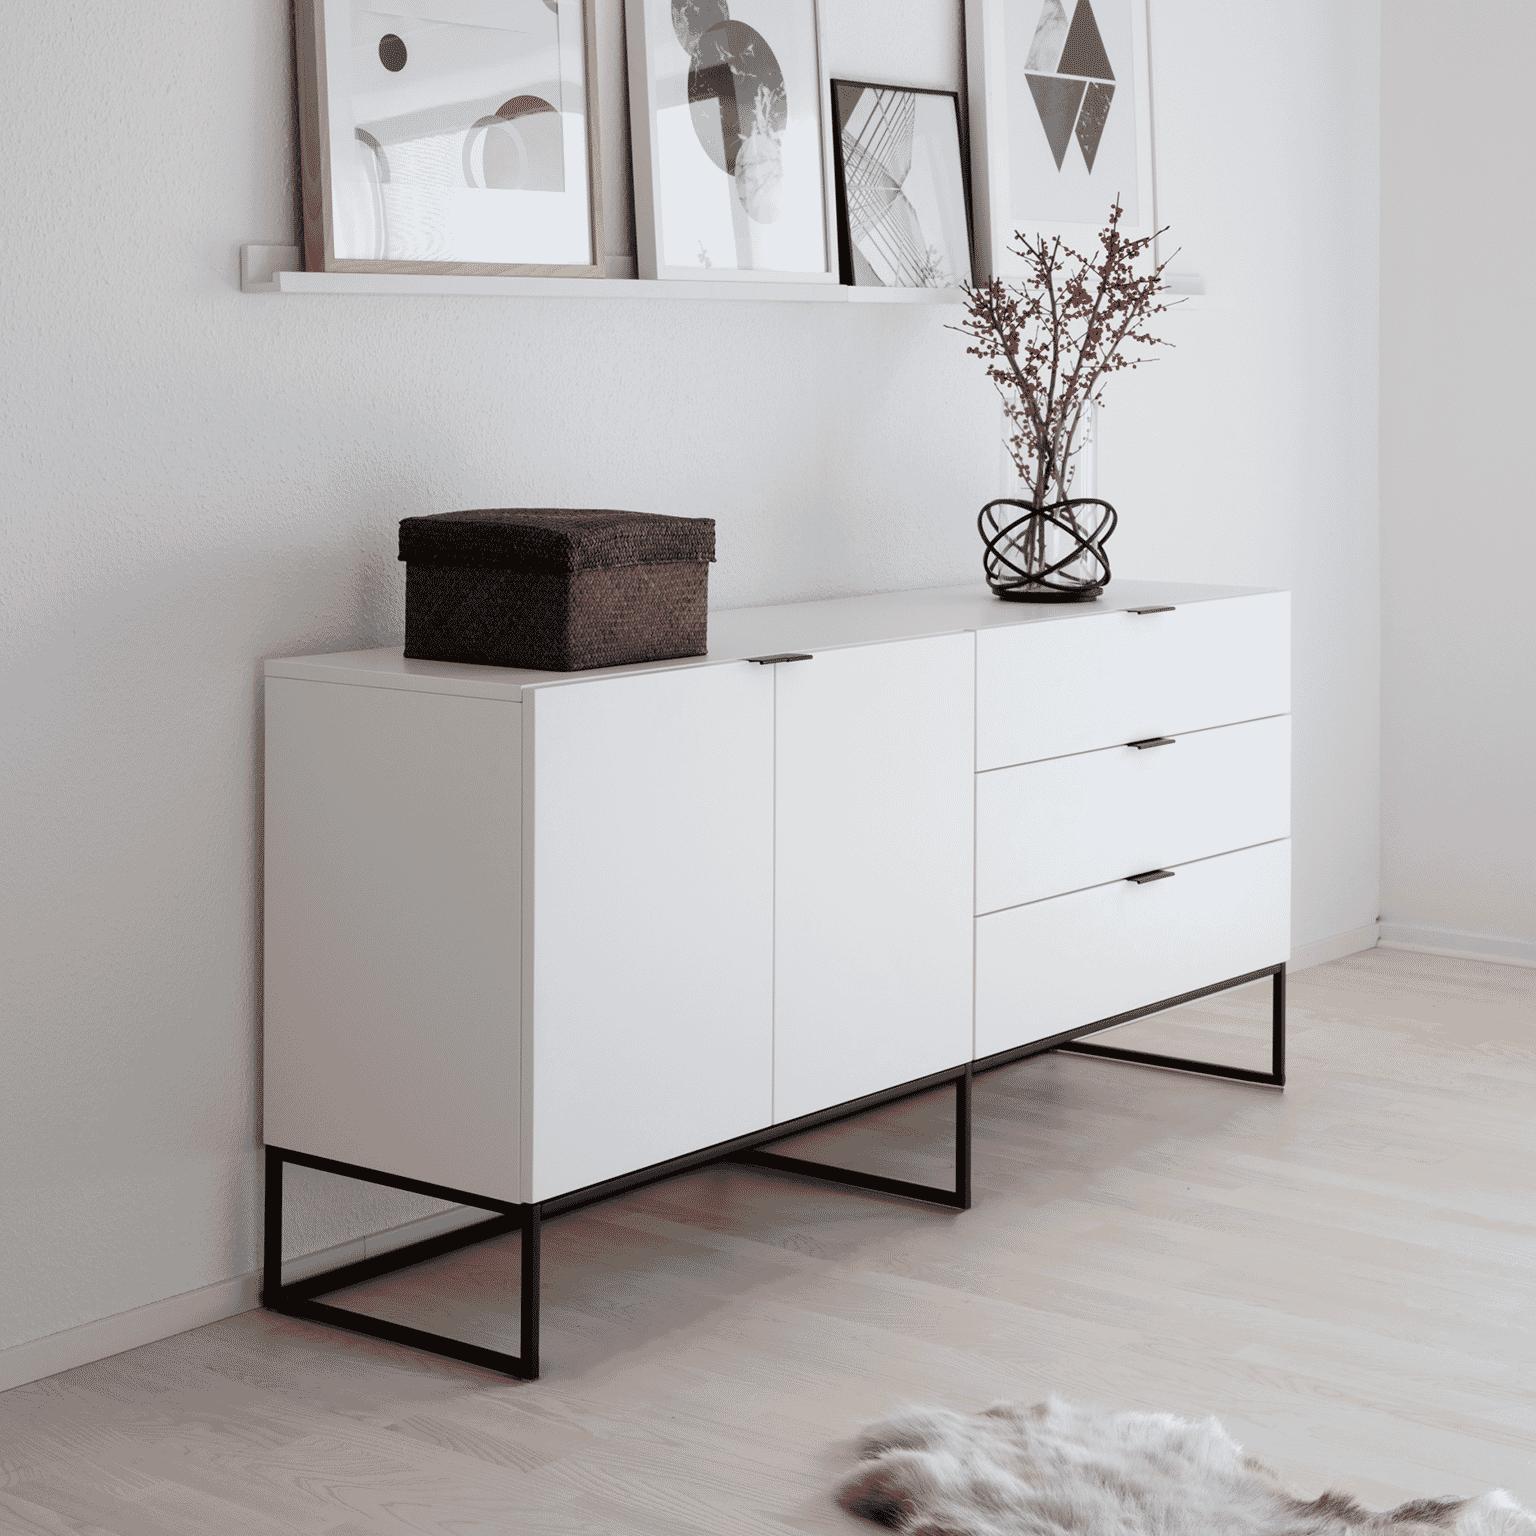 Interstil Dressoir 'Kobe' 180cm, kleur wit met voordeel snel in huis via Meubel Partner